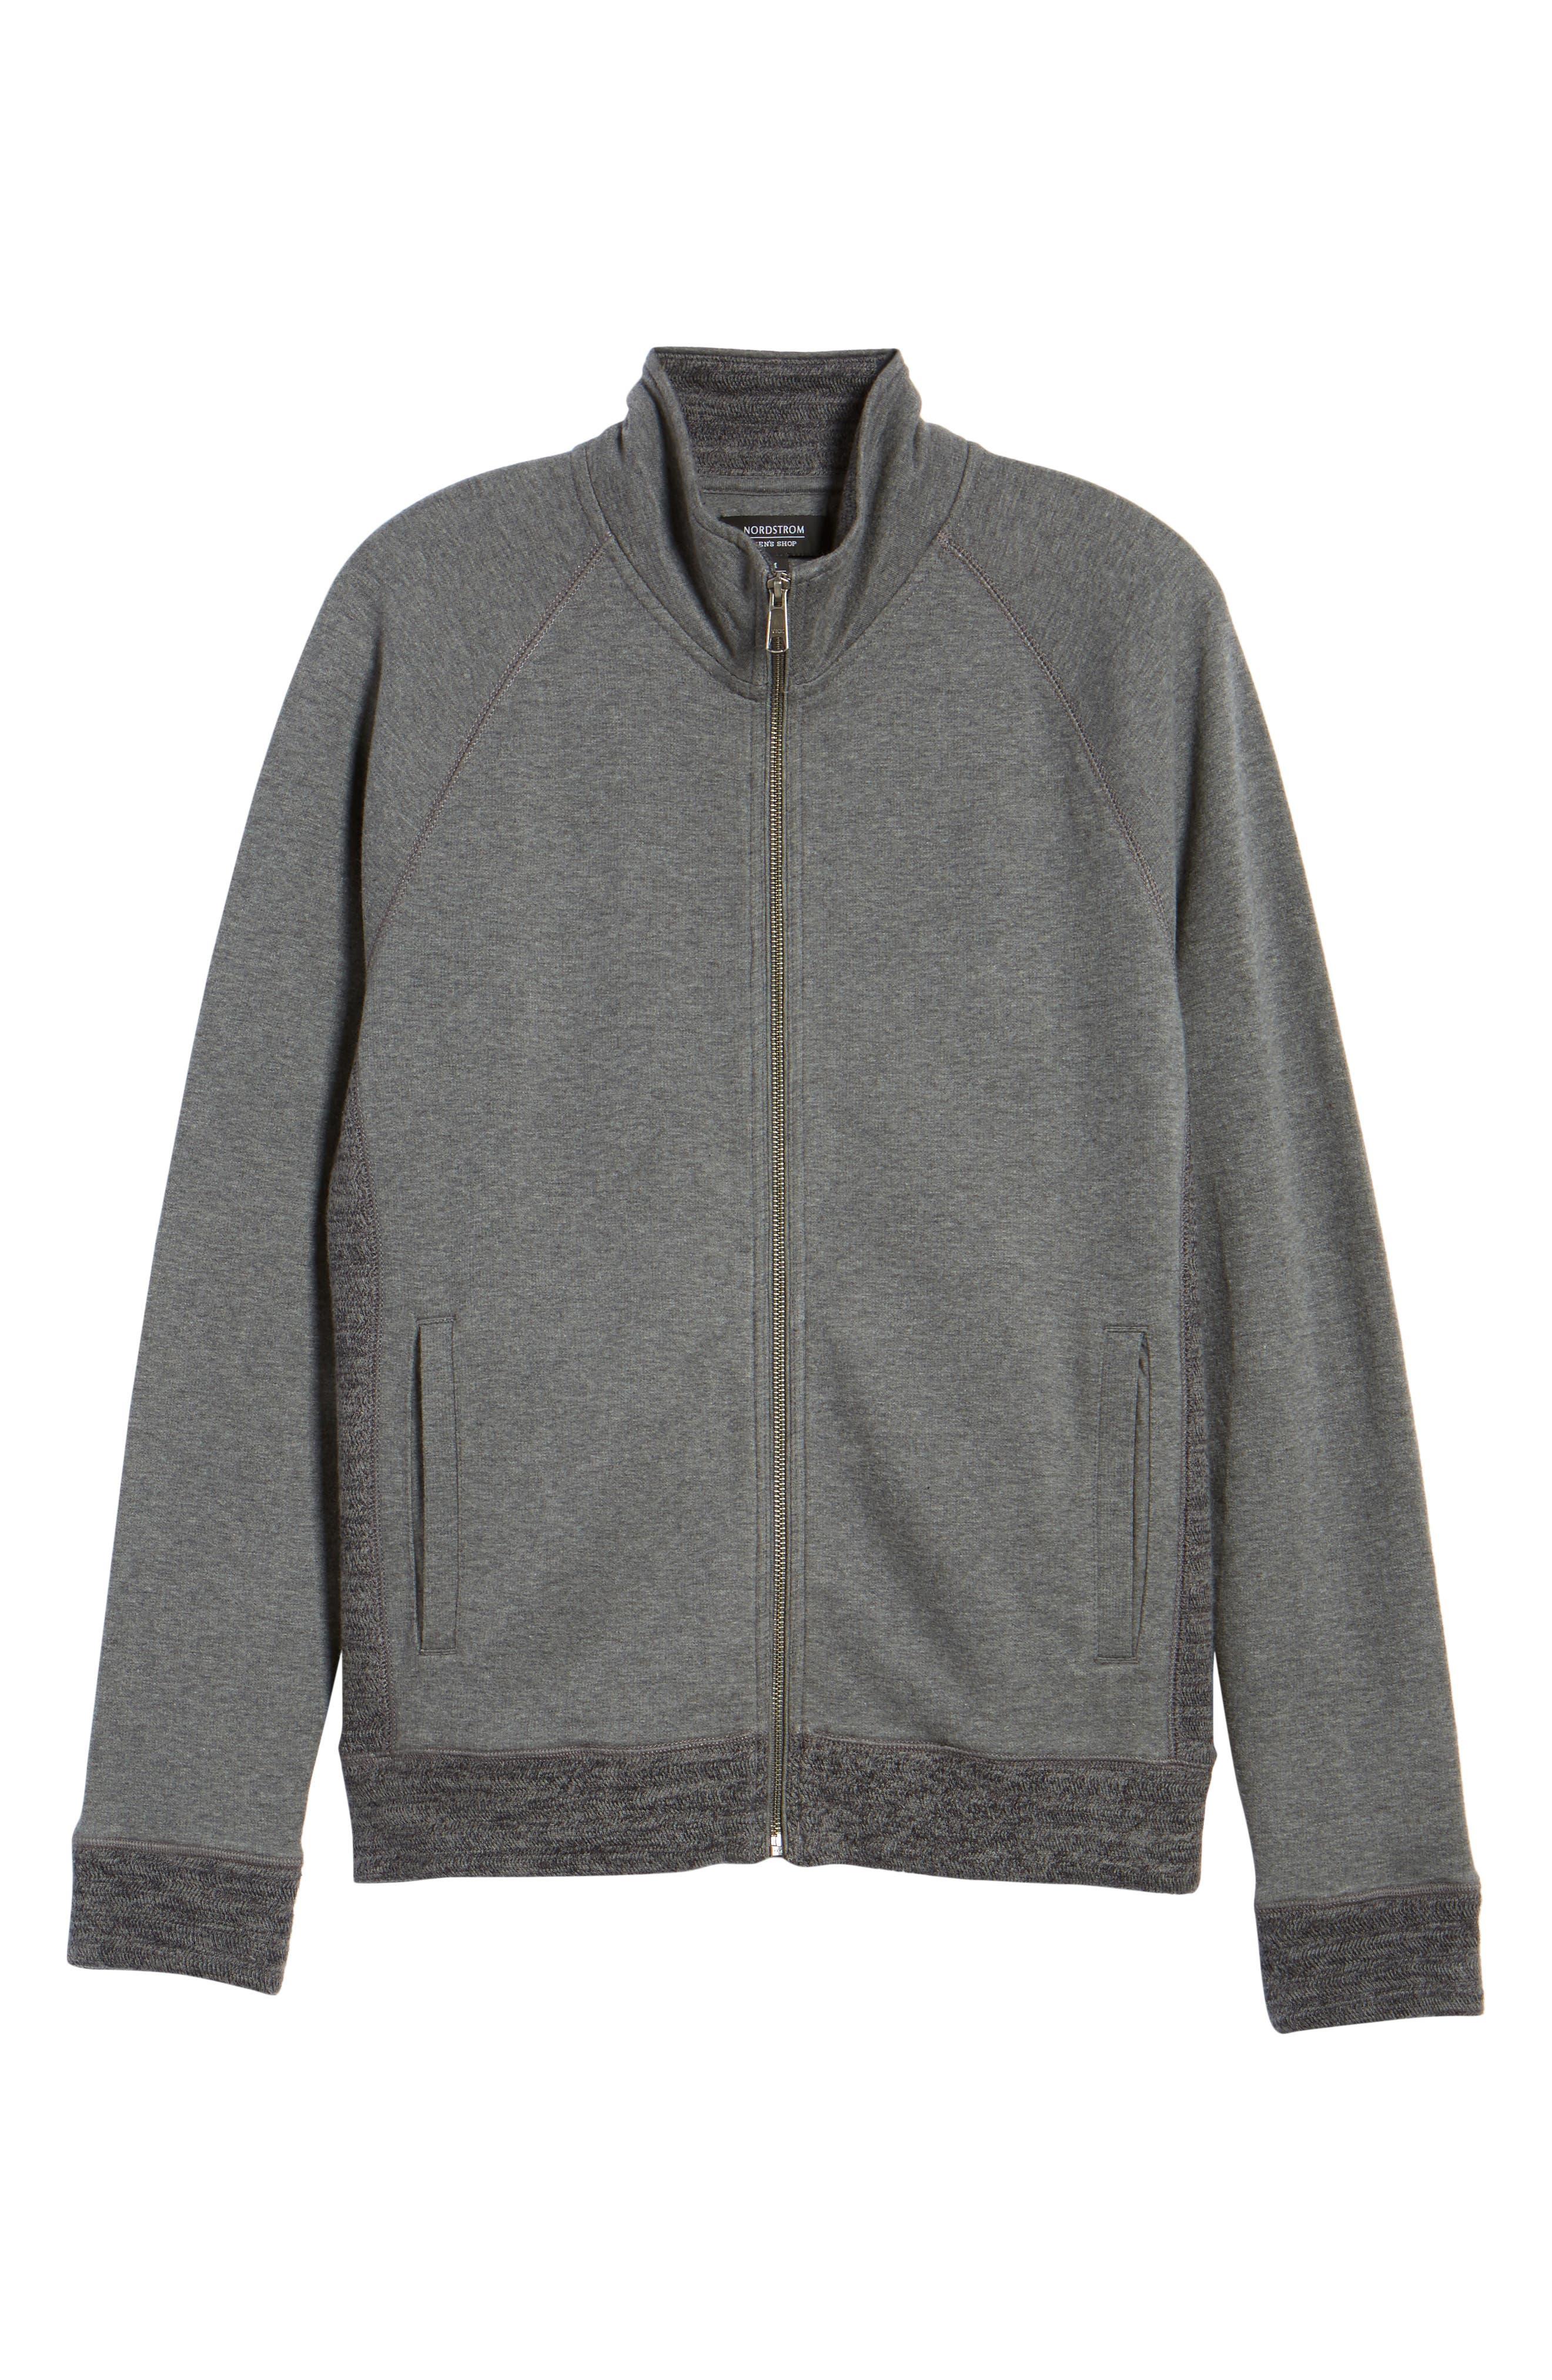 Full Zip Fleece Jacket,                             Alternate thumbnail 6, color,                             Charcoal Heather